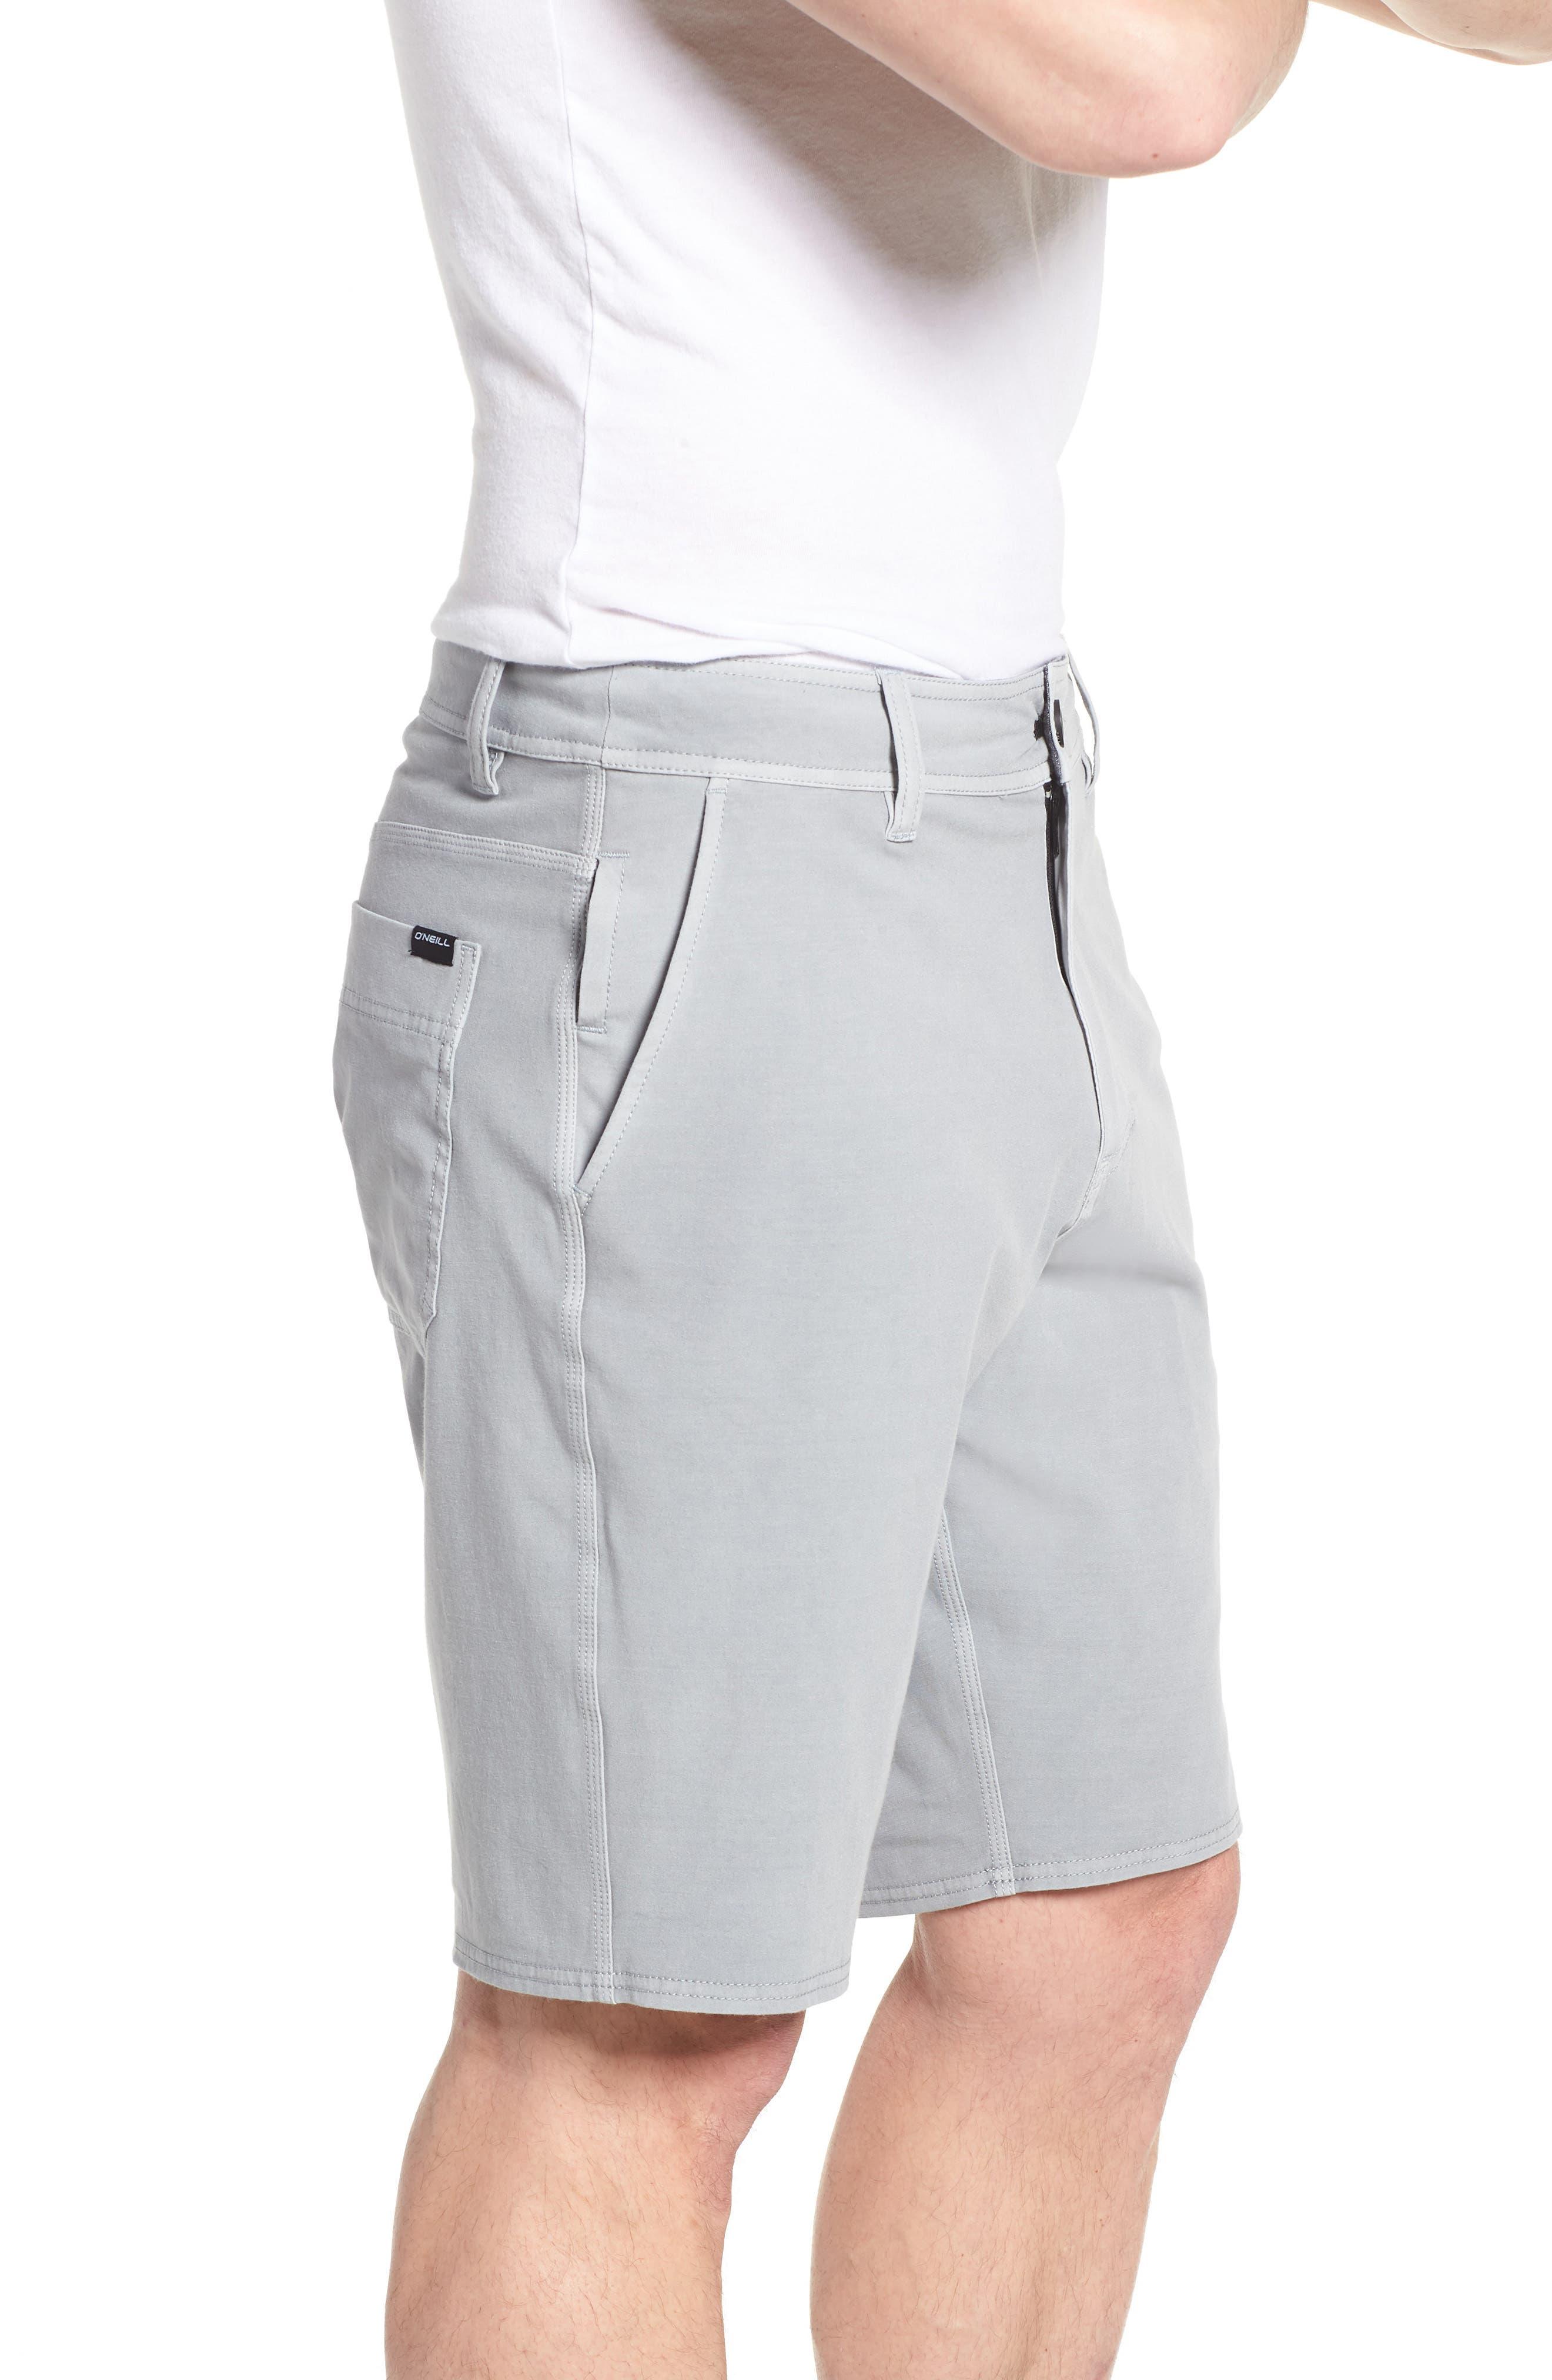 Venture Overdye Hybrid Shorts,                             Alternate thumbnail 3, color,                             039